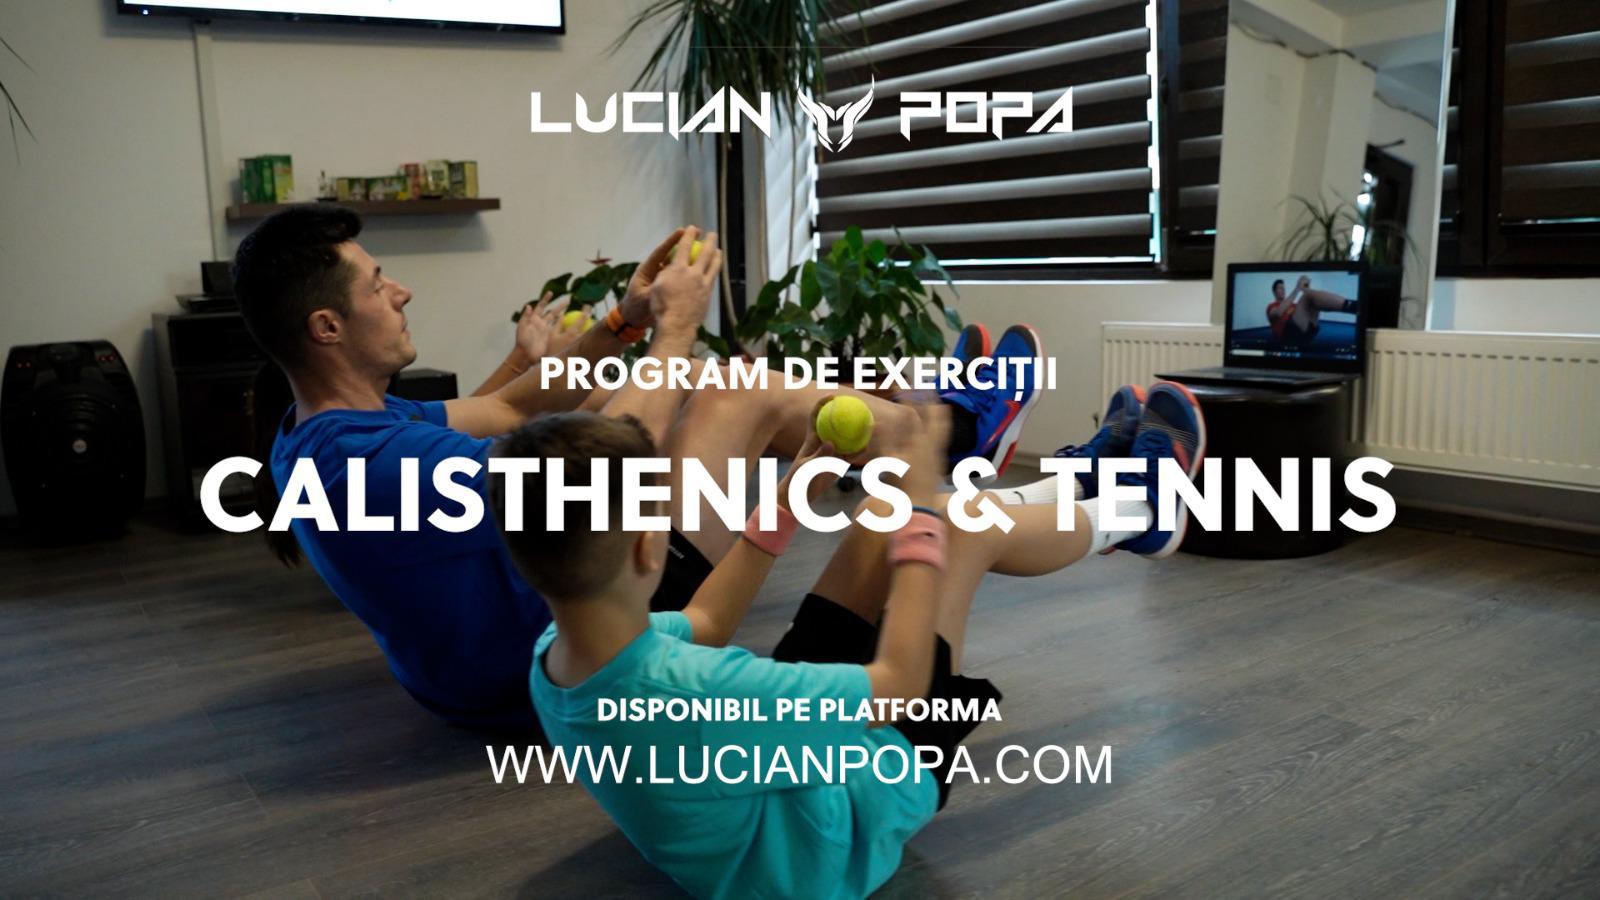 CALISTHENICS & TENNIS